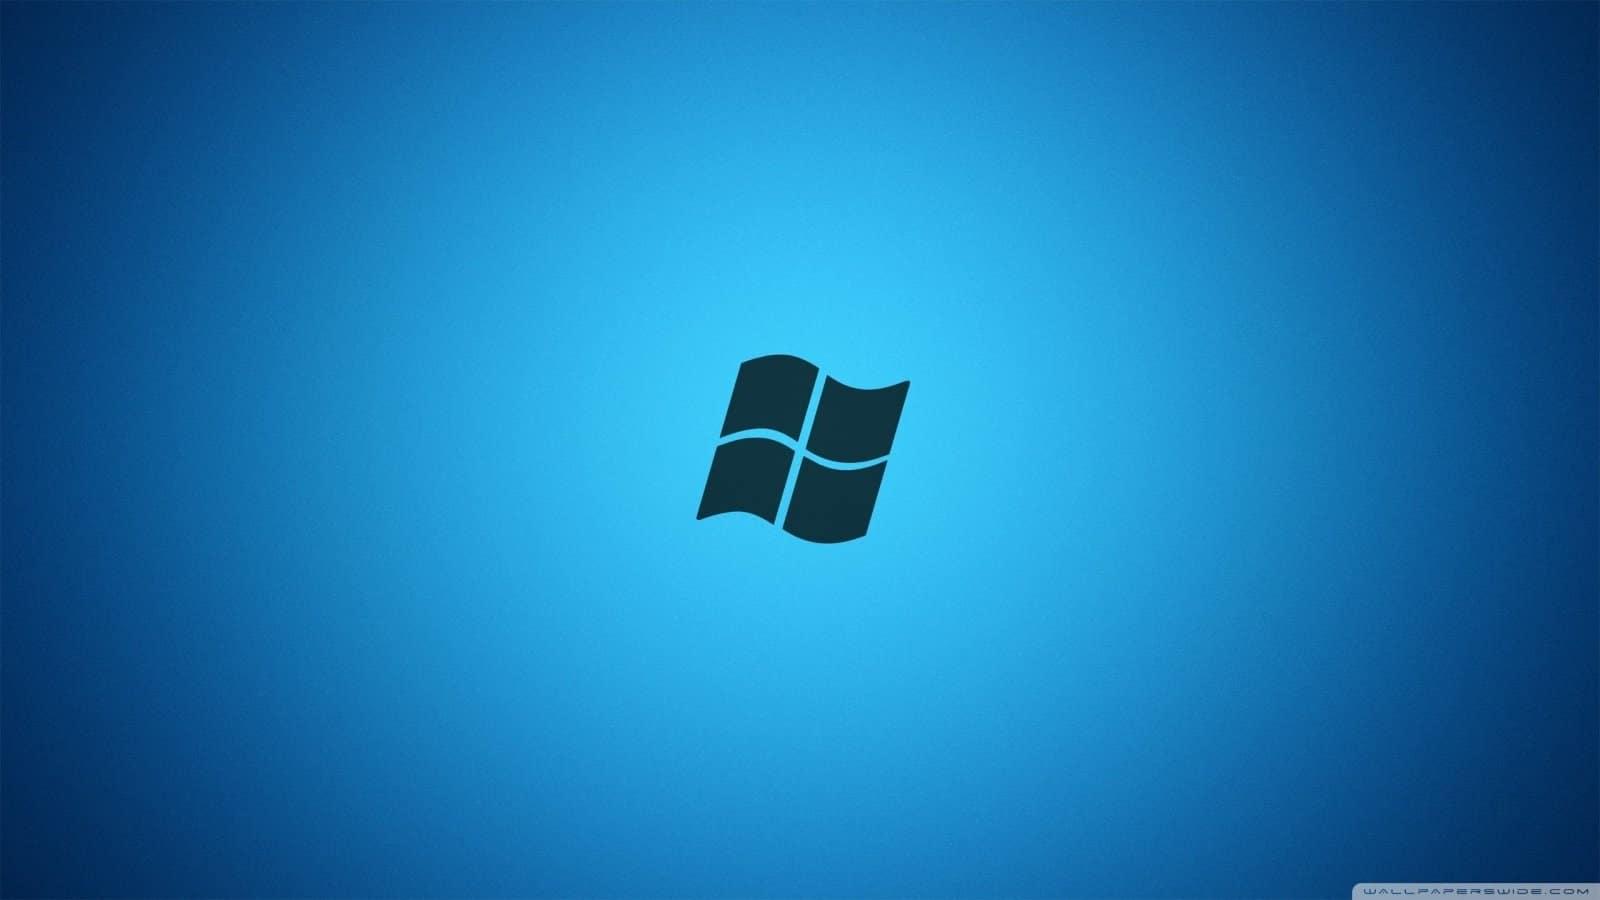 Windows 7 ita iso Download 32 bit